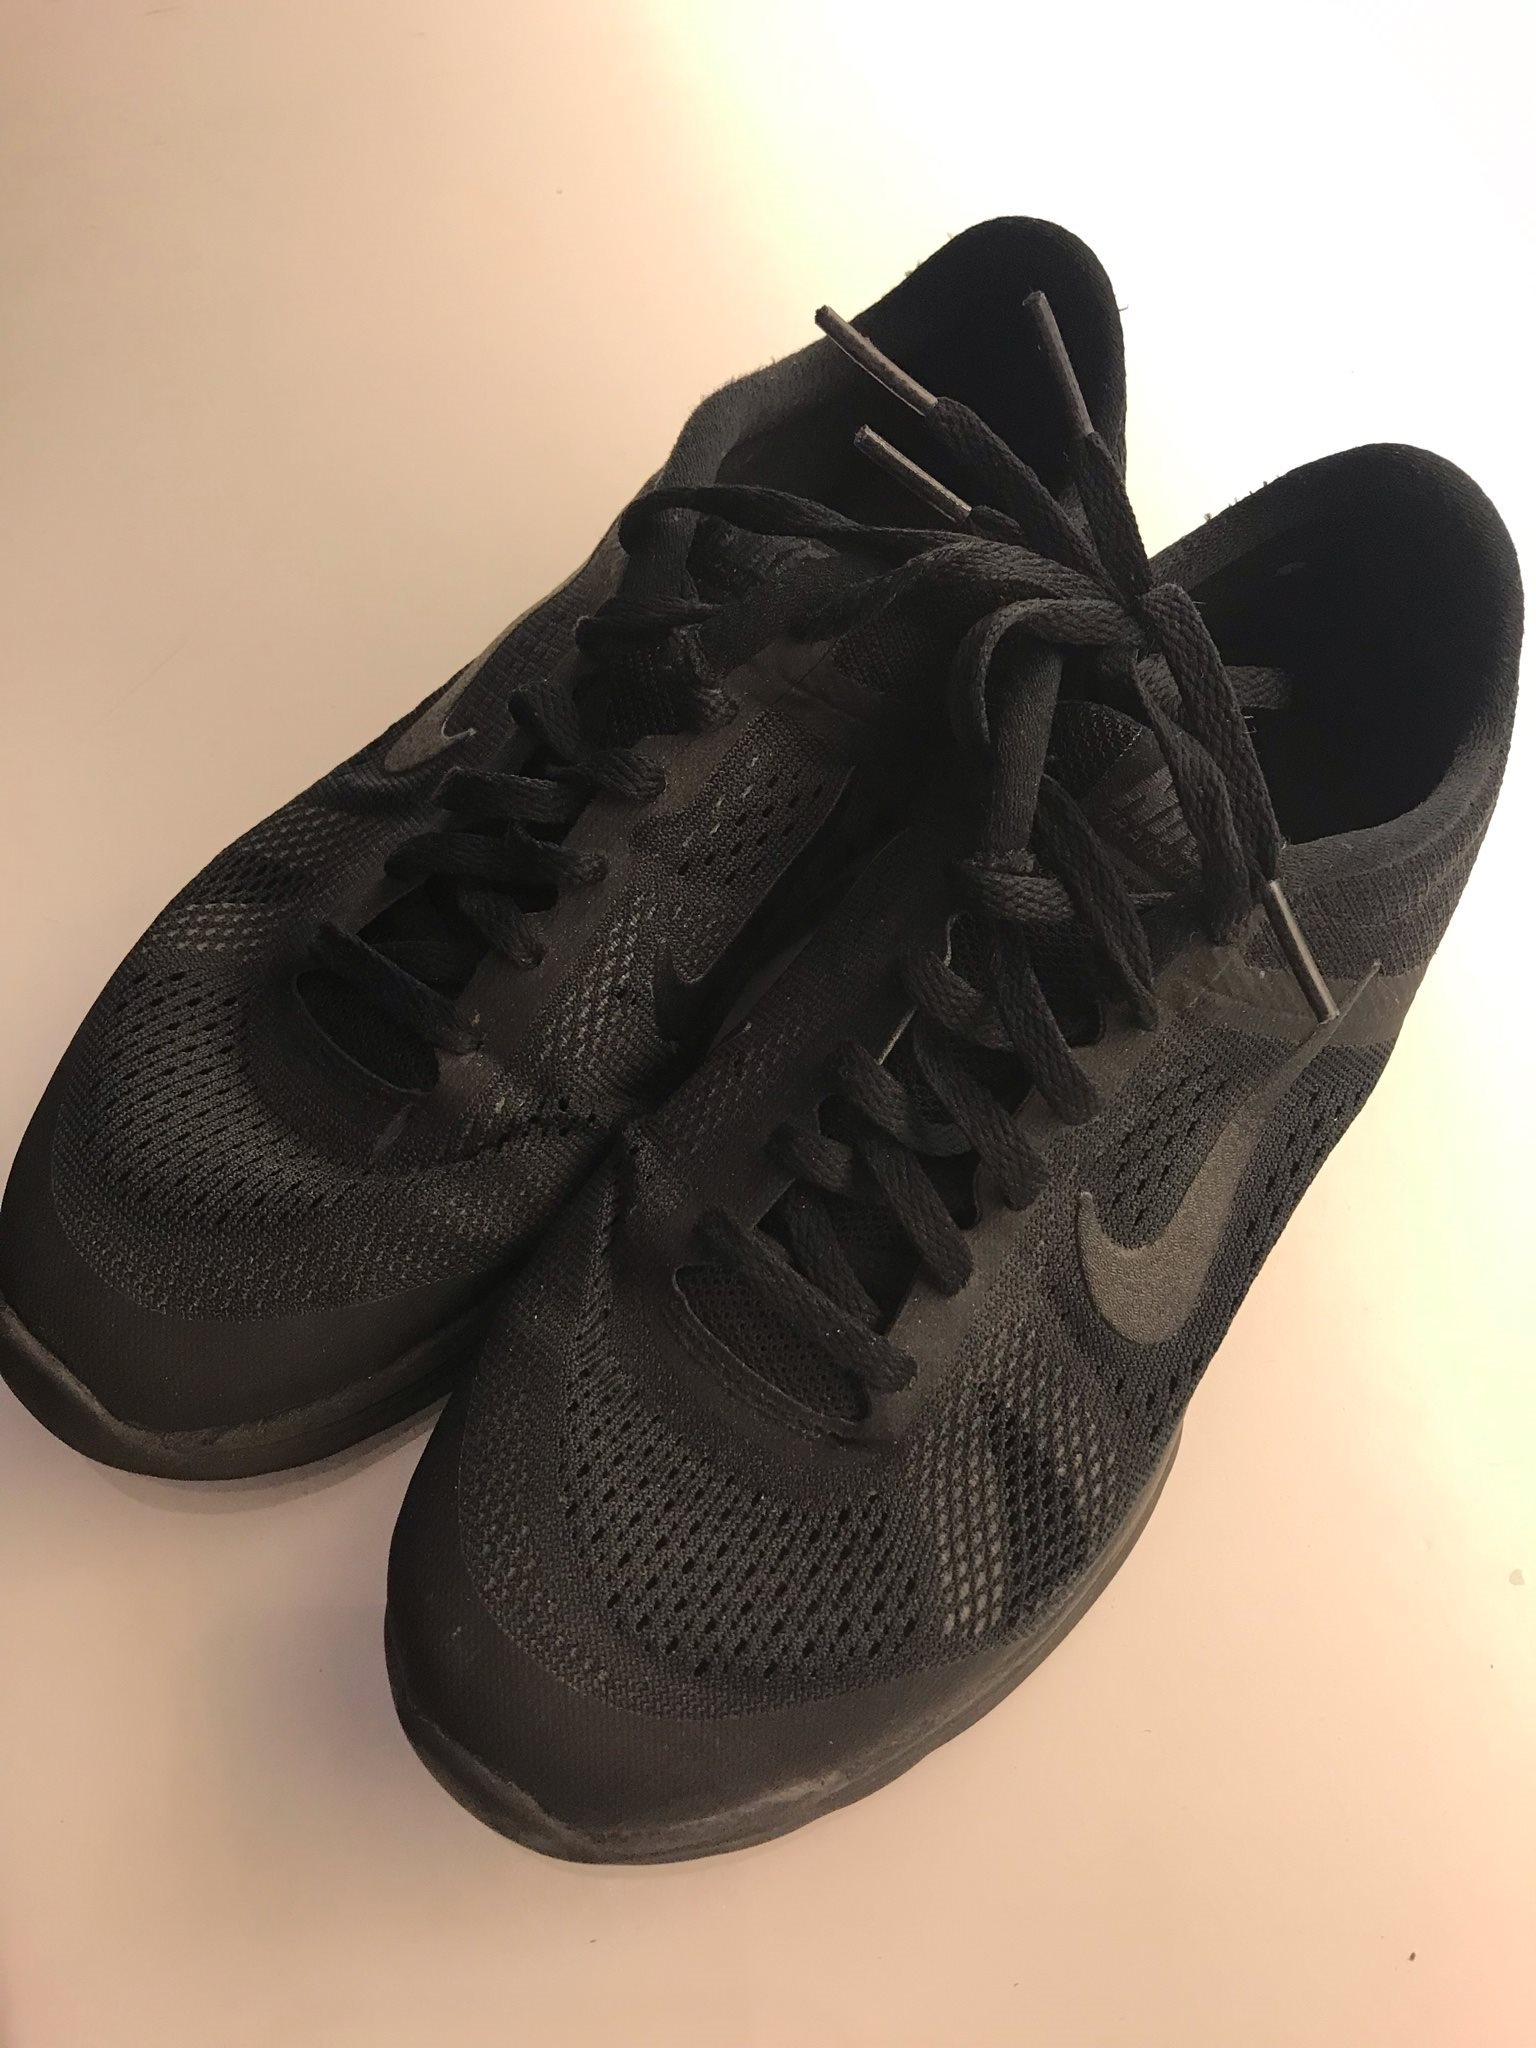 hot sale online a126b f6525 Skor 5 Nike 36 Stl Nya 335089439 S5q8p